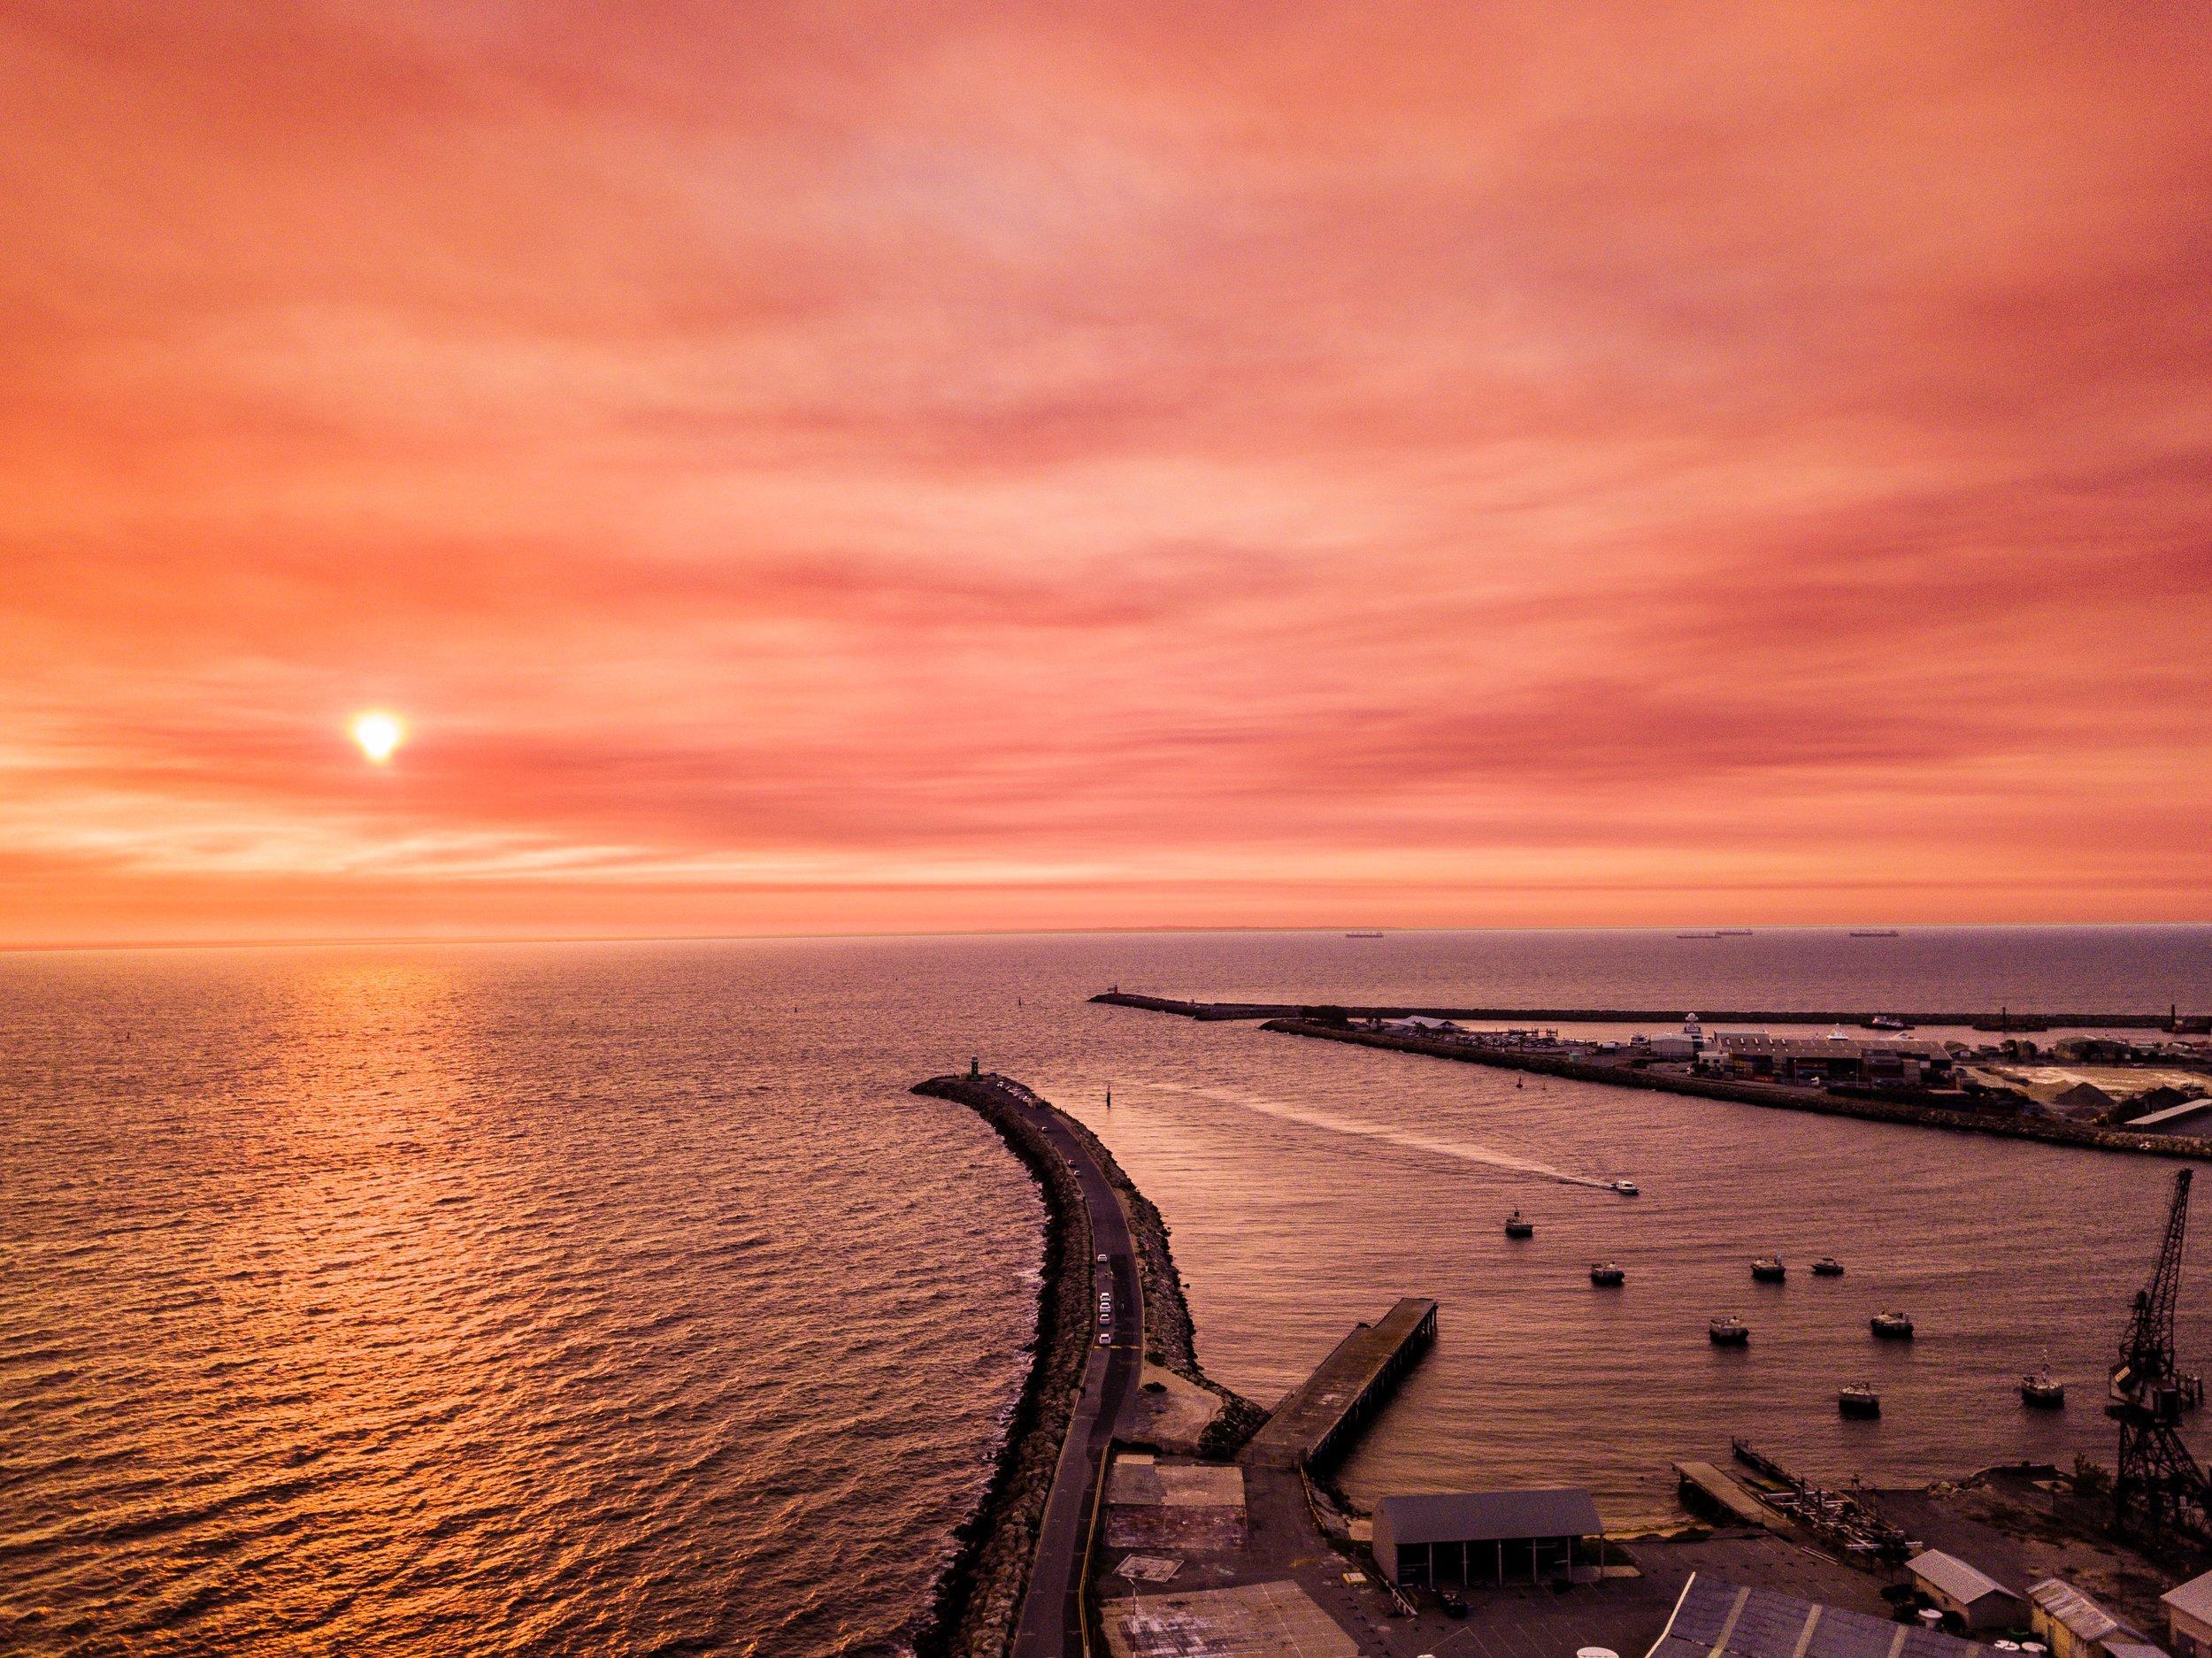 hellolovelyliving.com | Wanderlust To Australia - A Day In Fremantle